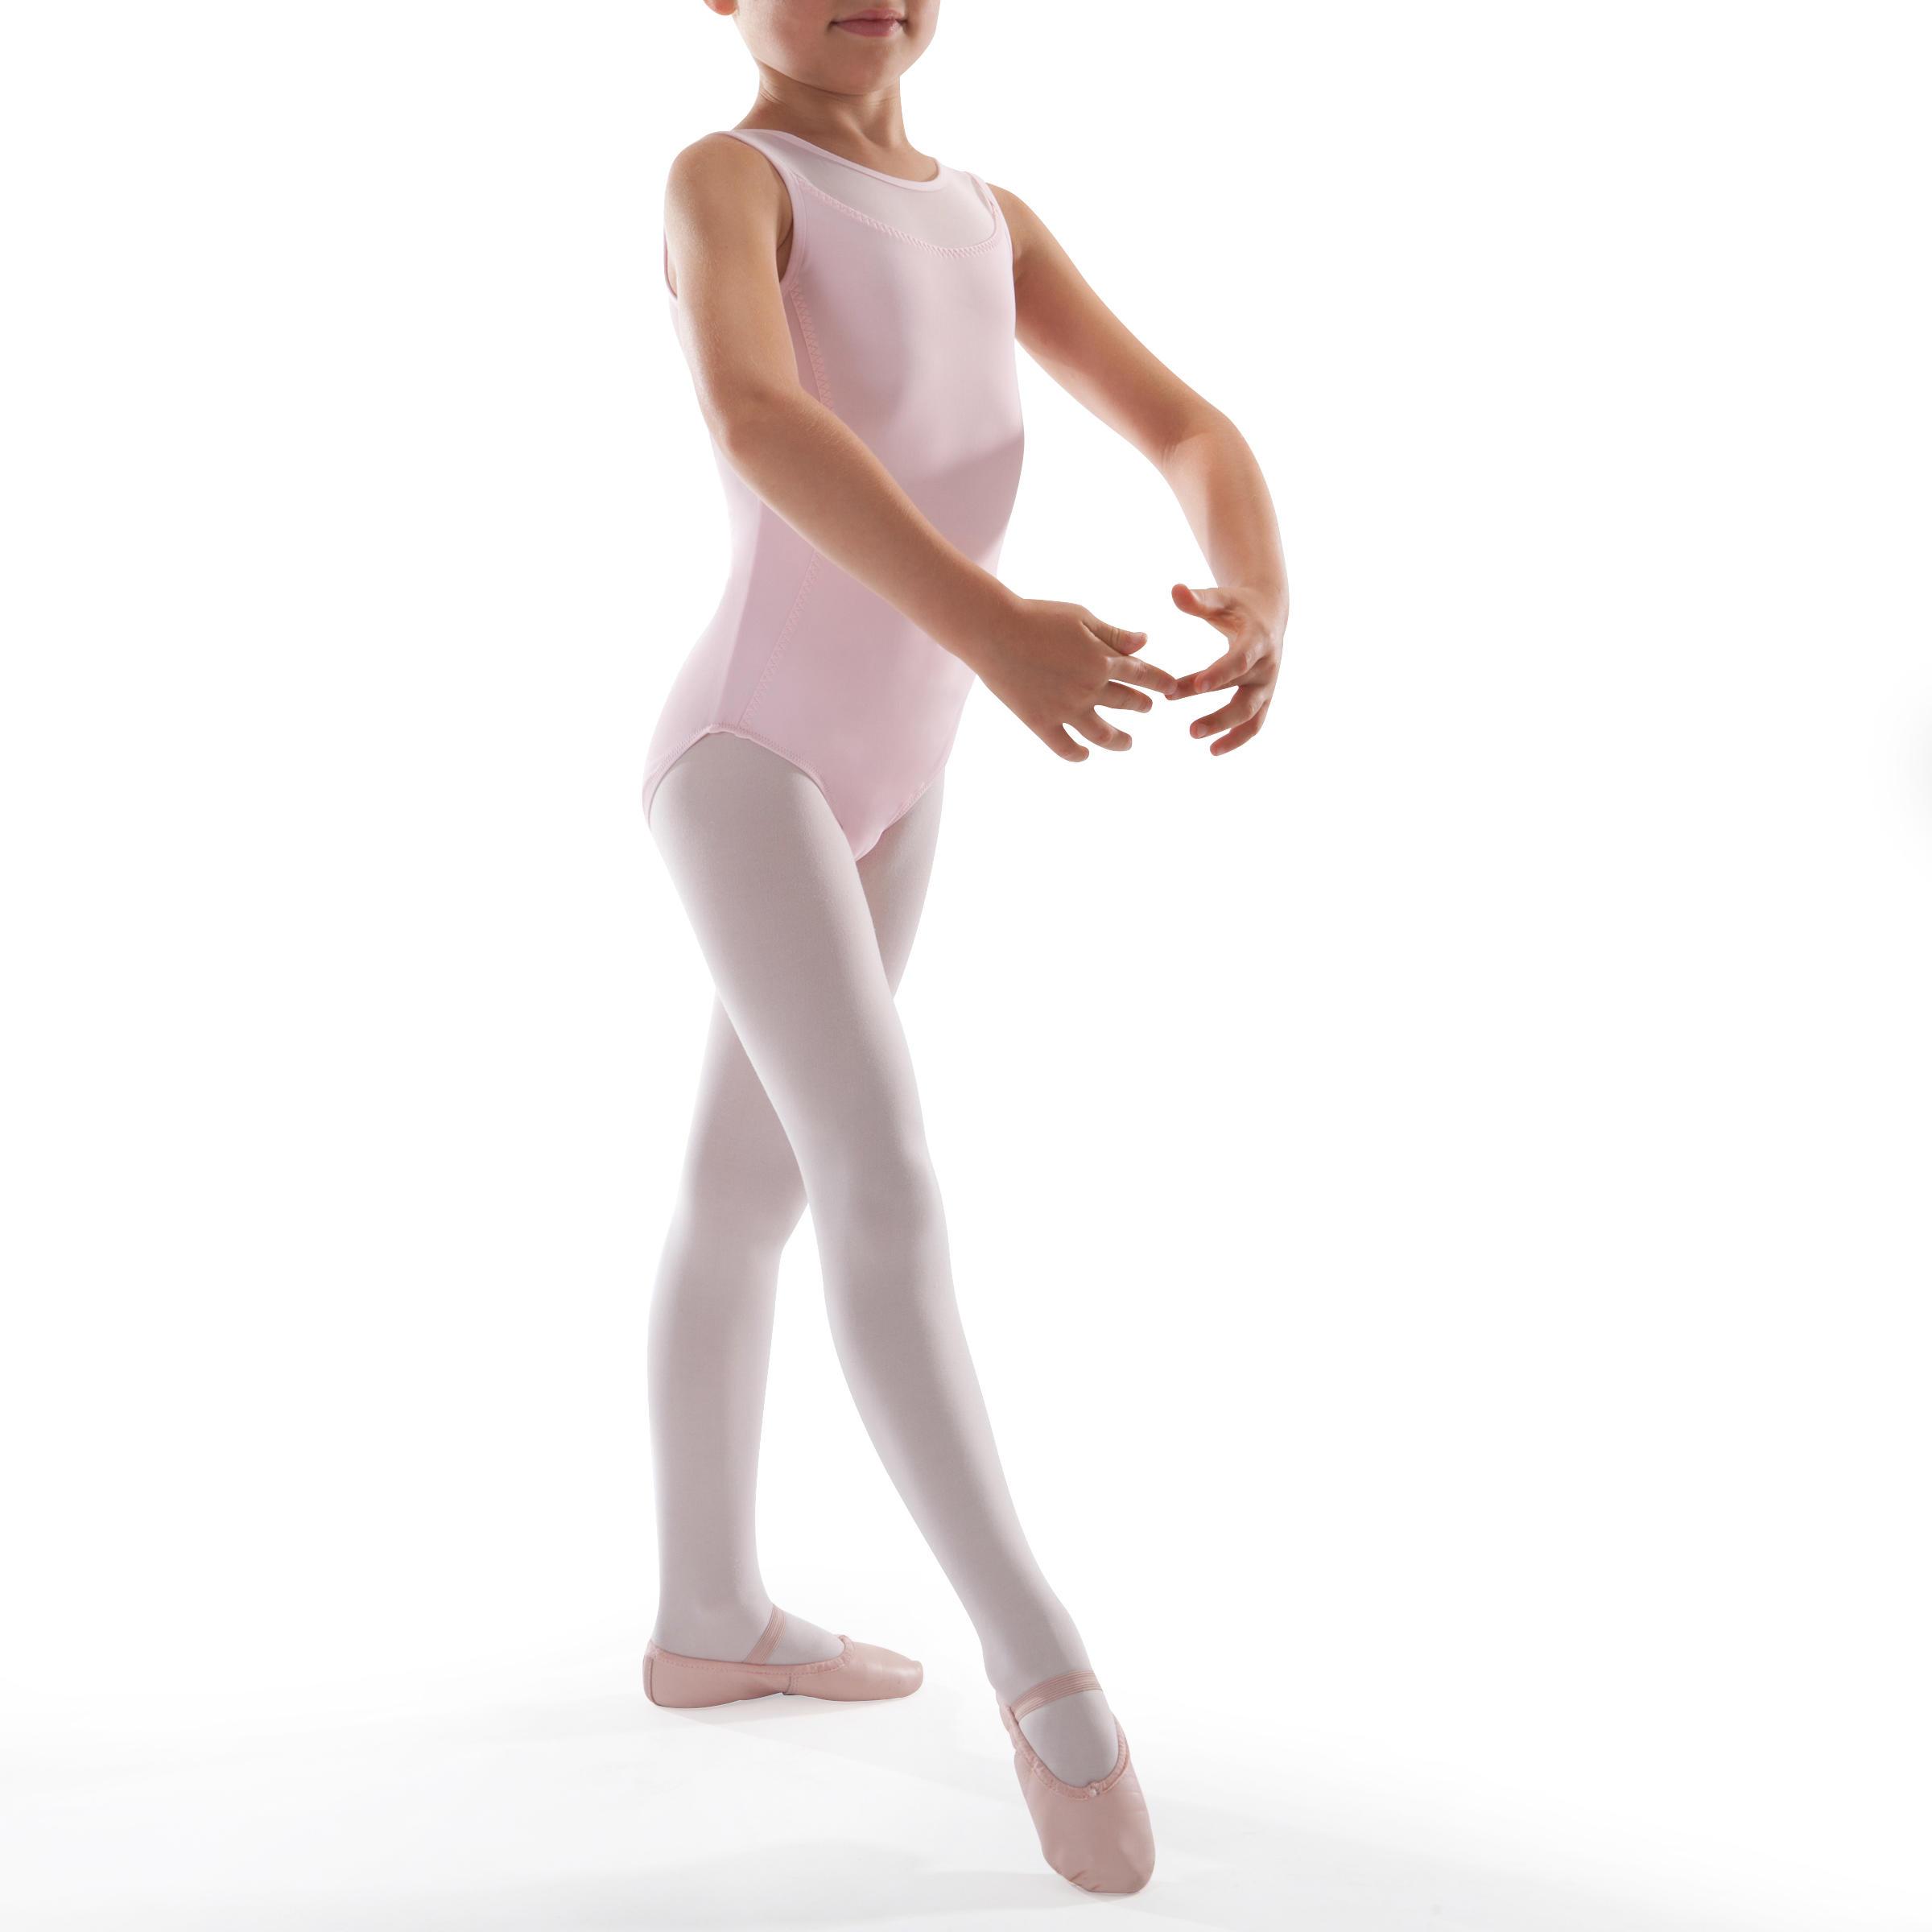 Léotard de danse classique bi-matière fille rose